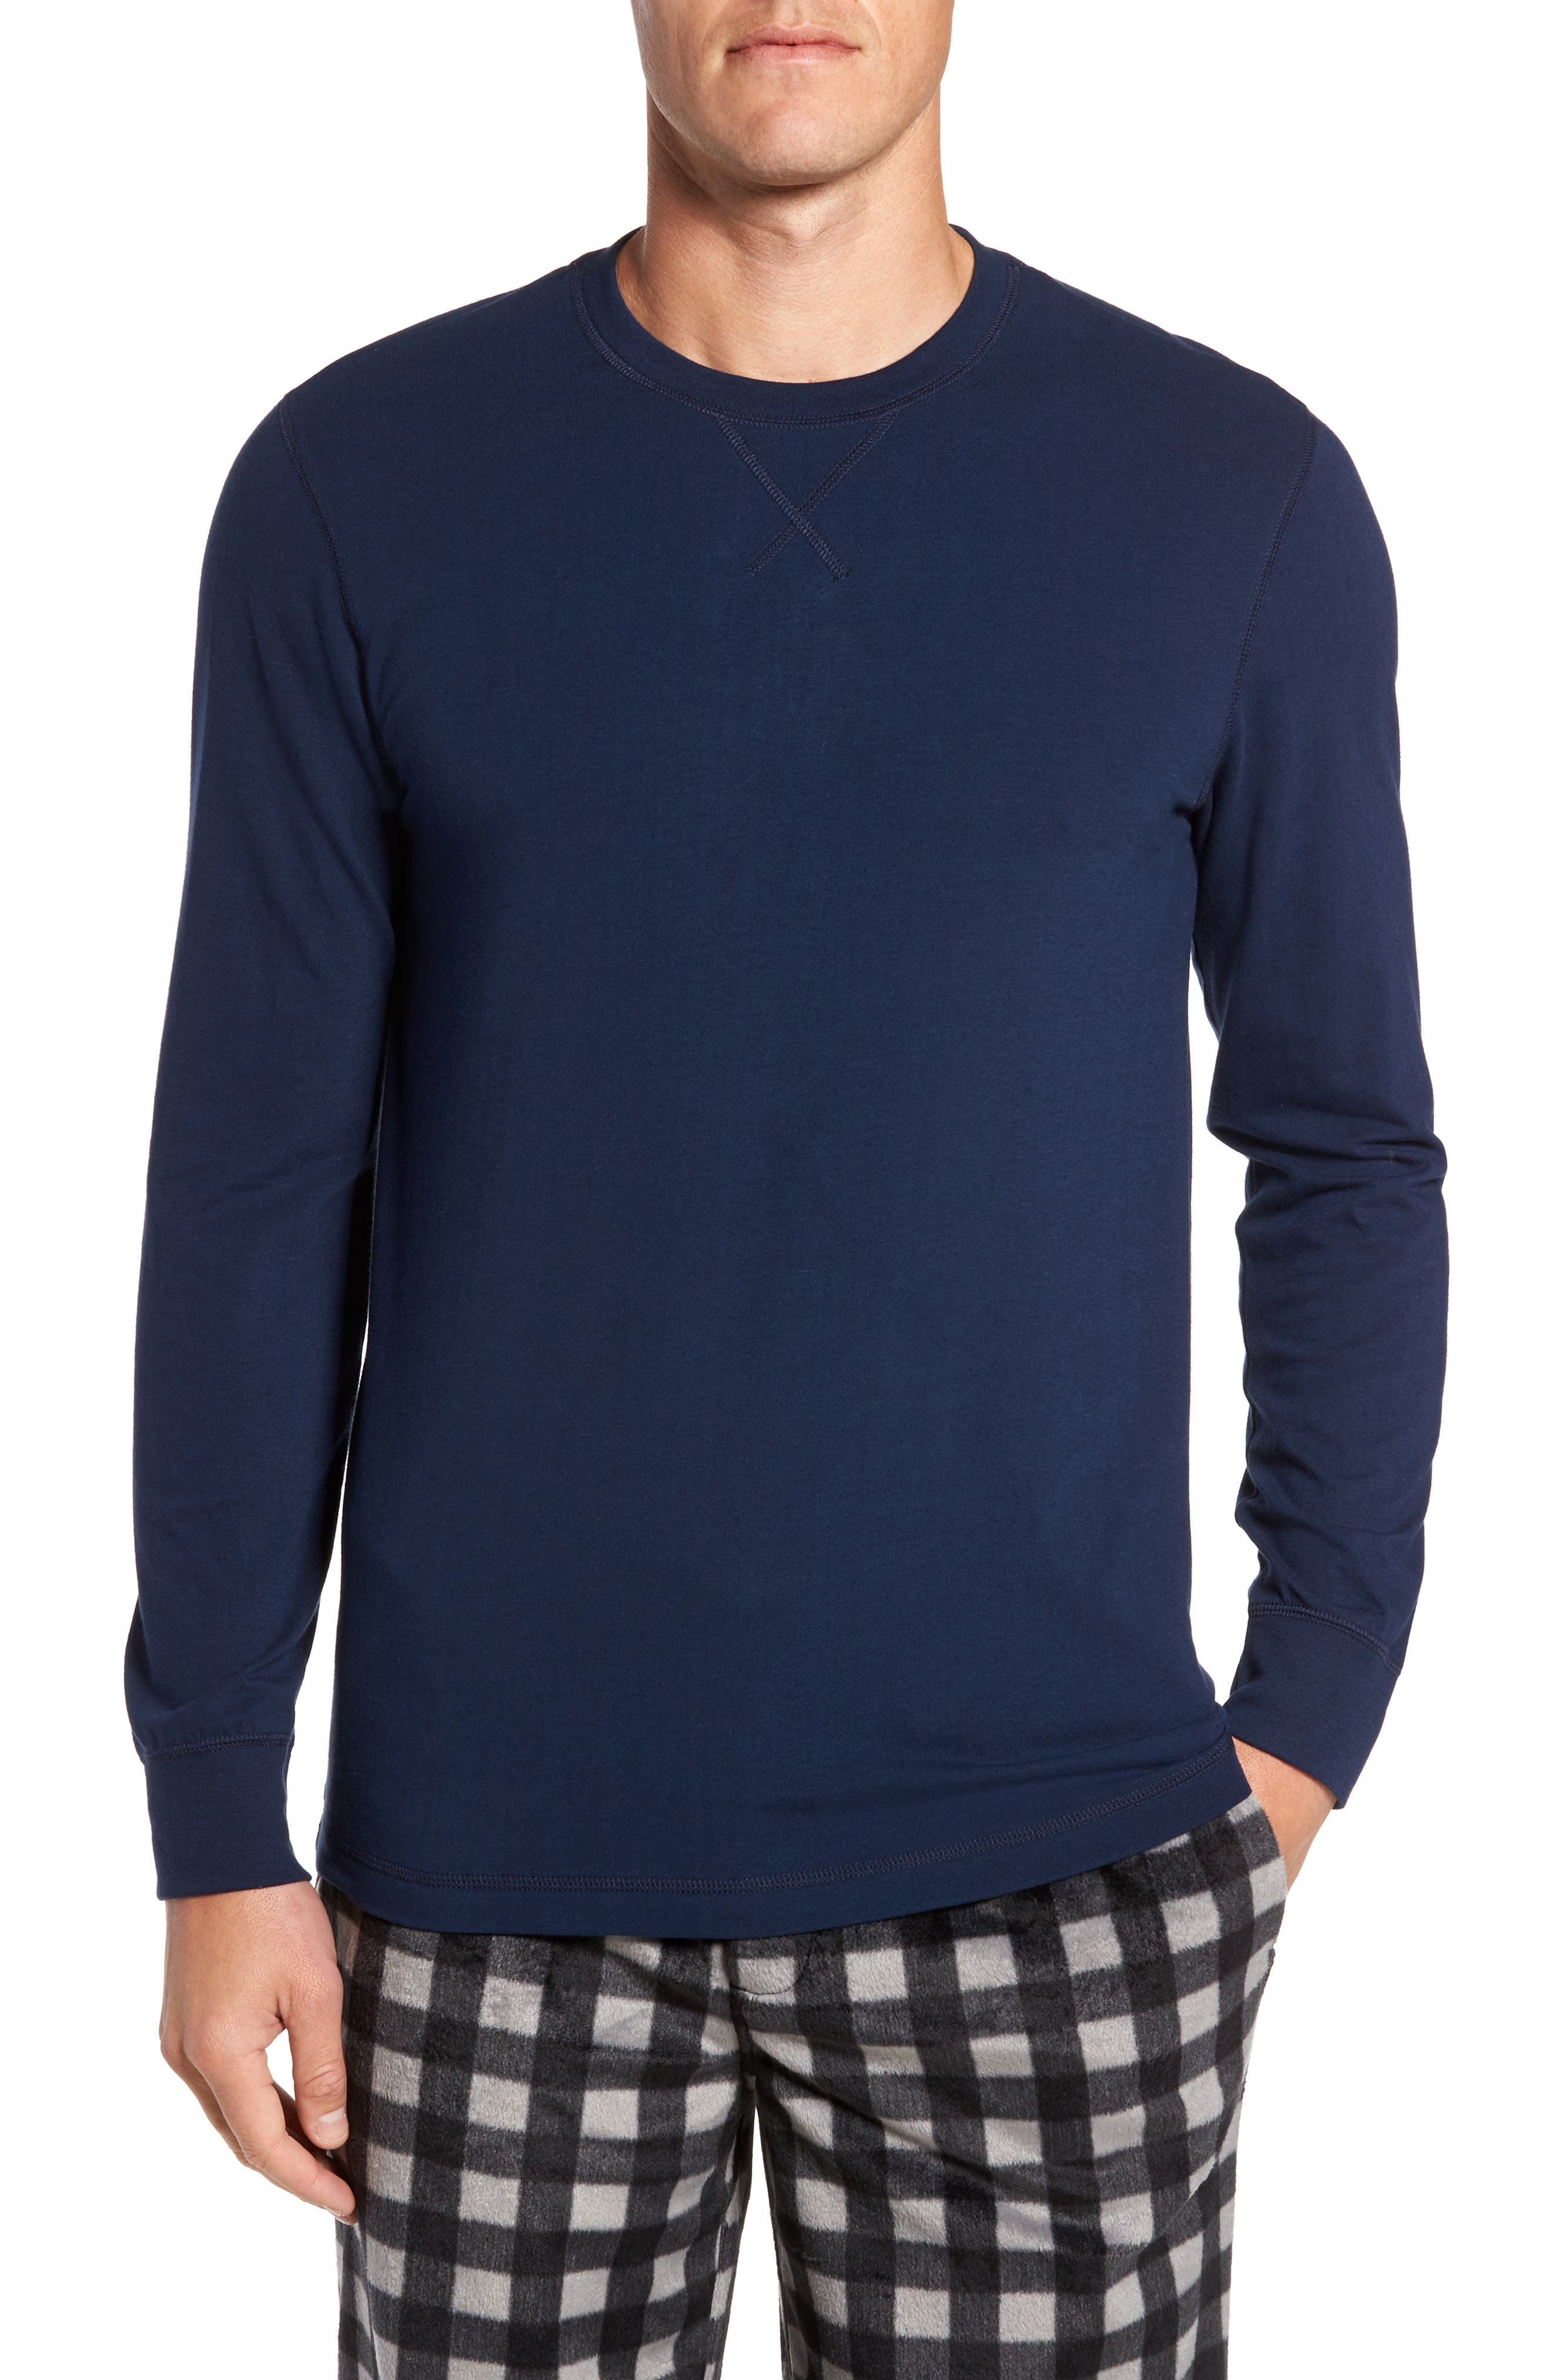 Main Image - Nordstrom Men's Shop Stretch Cotton Long Sleeve T-Shirt